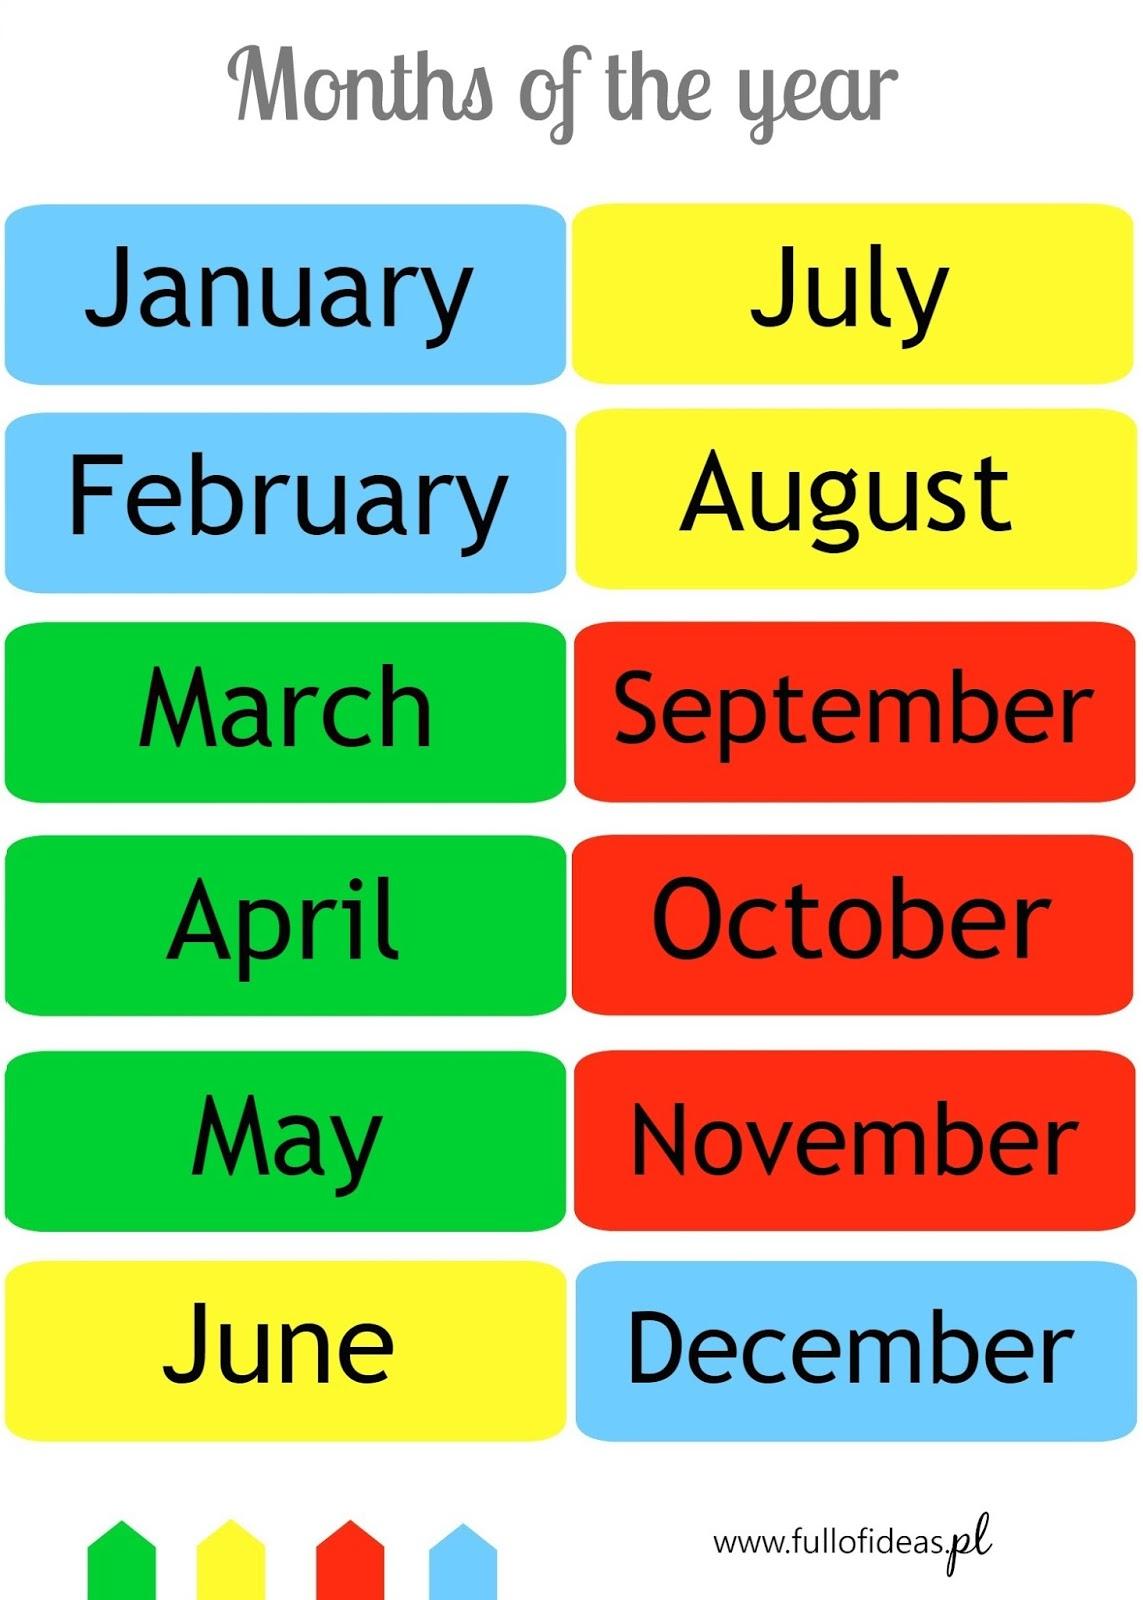 4 Seasons 12 Months Head Full Of Ideas